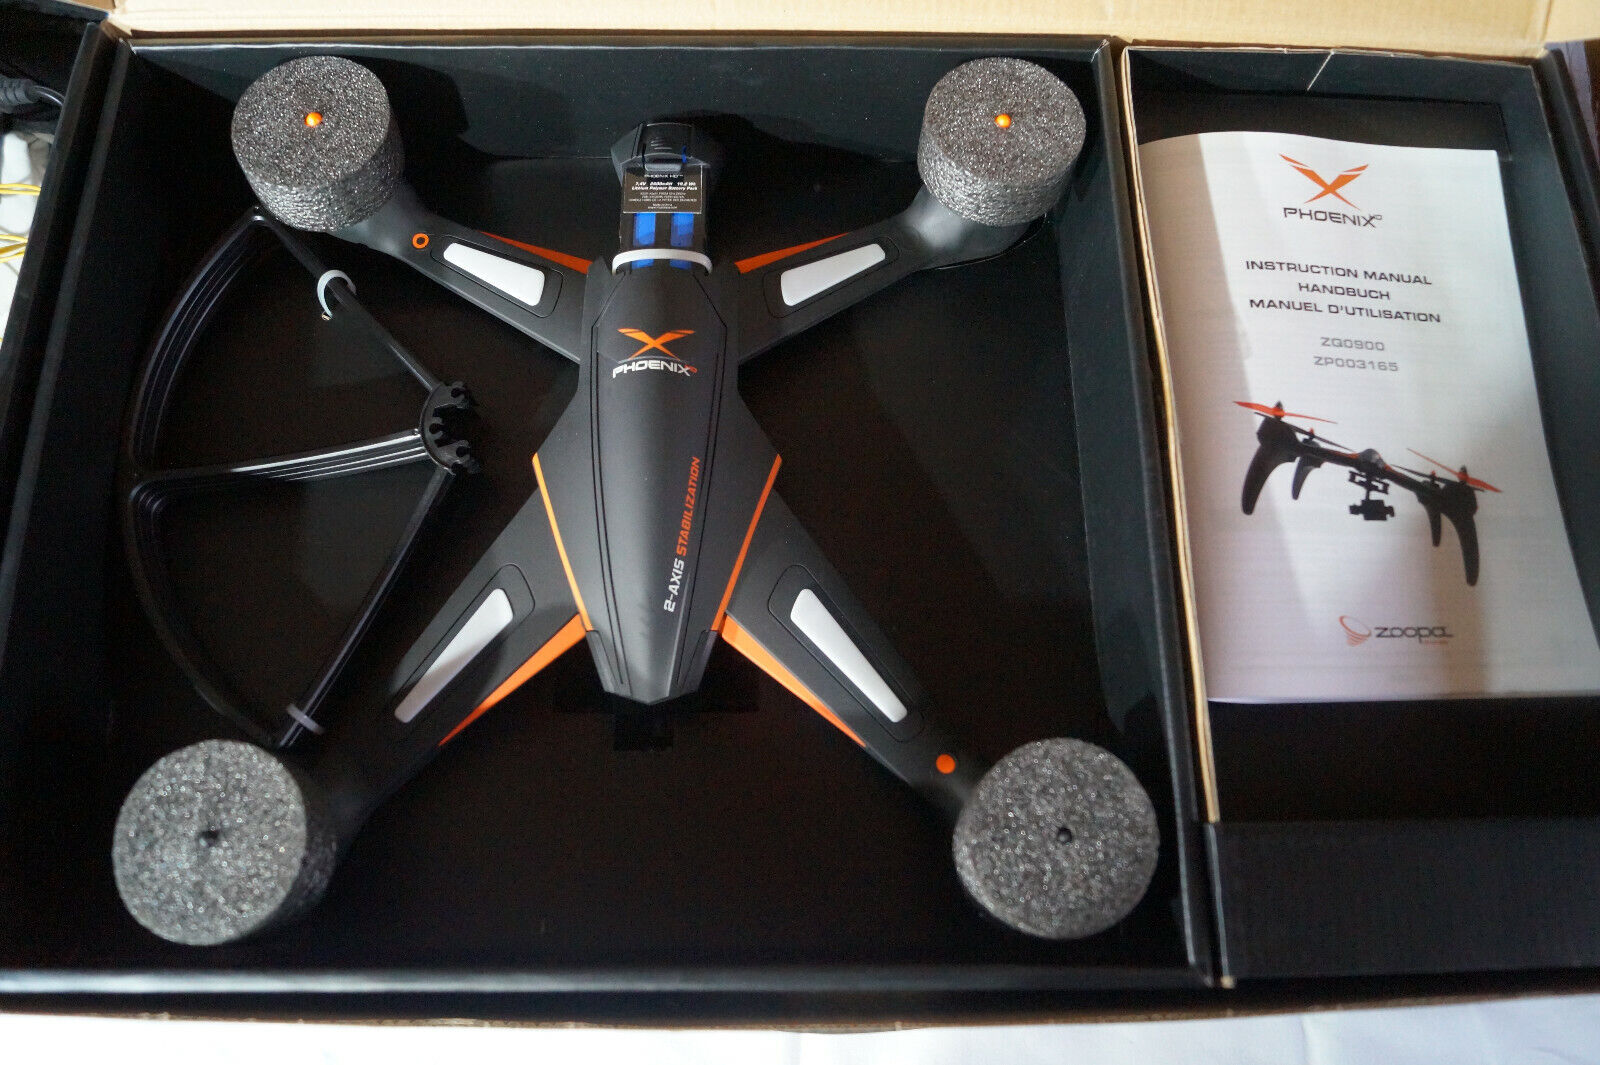 zoopa phoenix Hd Drohne Quadrocopter Copter Modellflug Cam Video Wifi